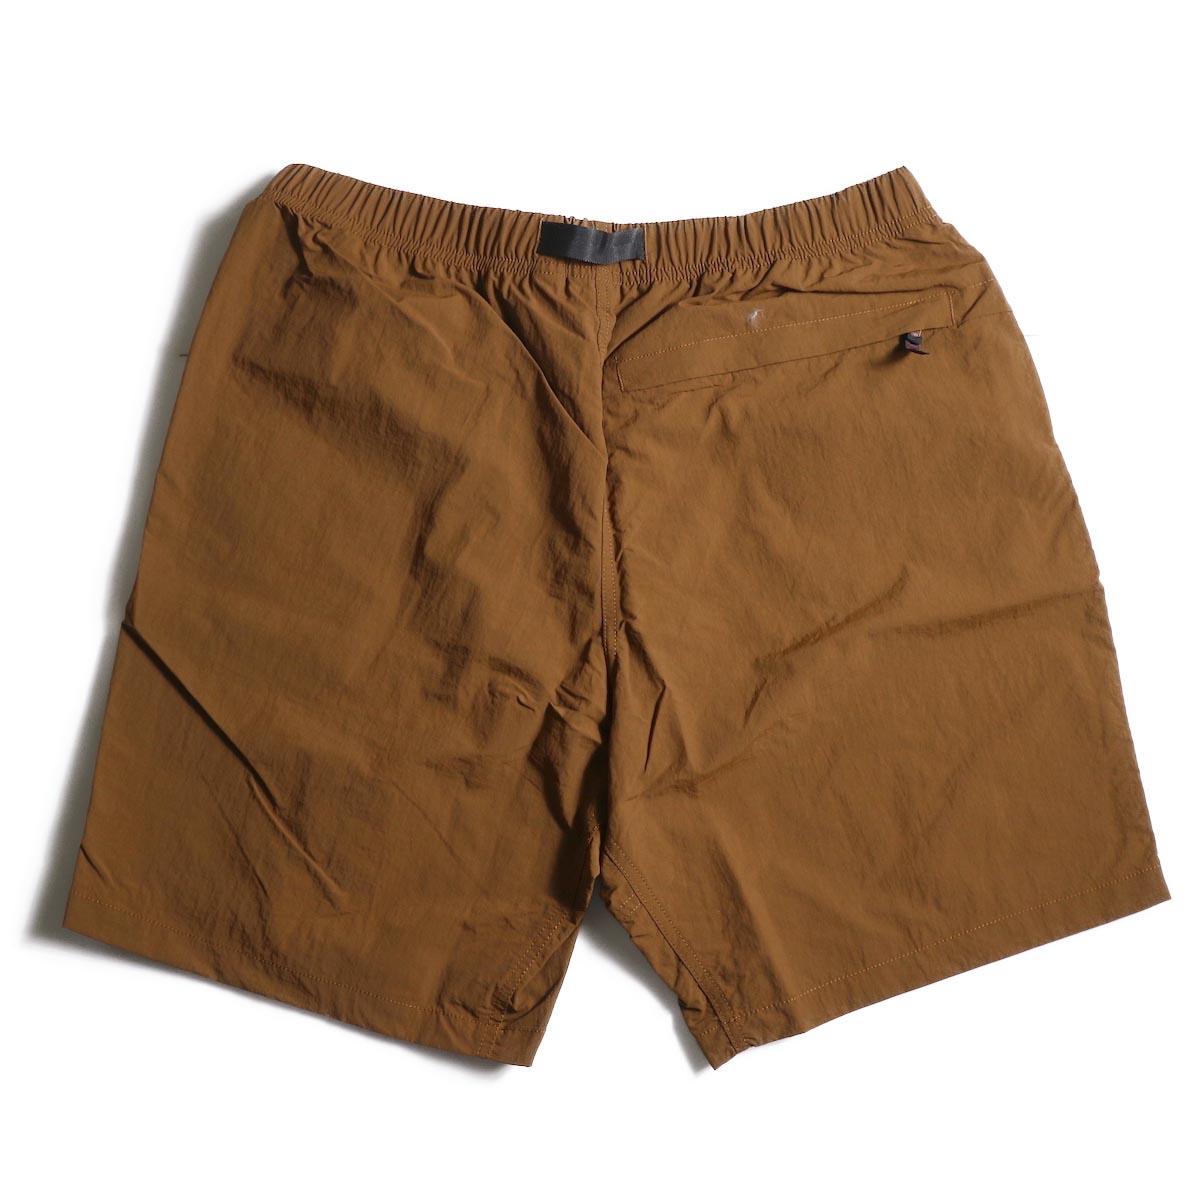 GRAMICCI / Shell Packable Shorts (Mocha)背面